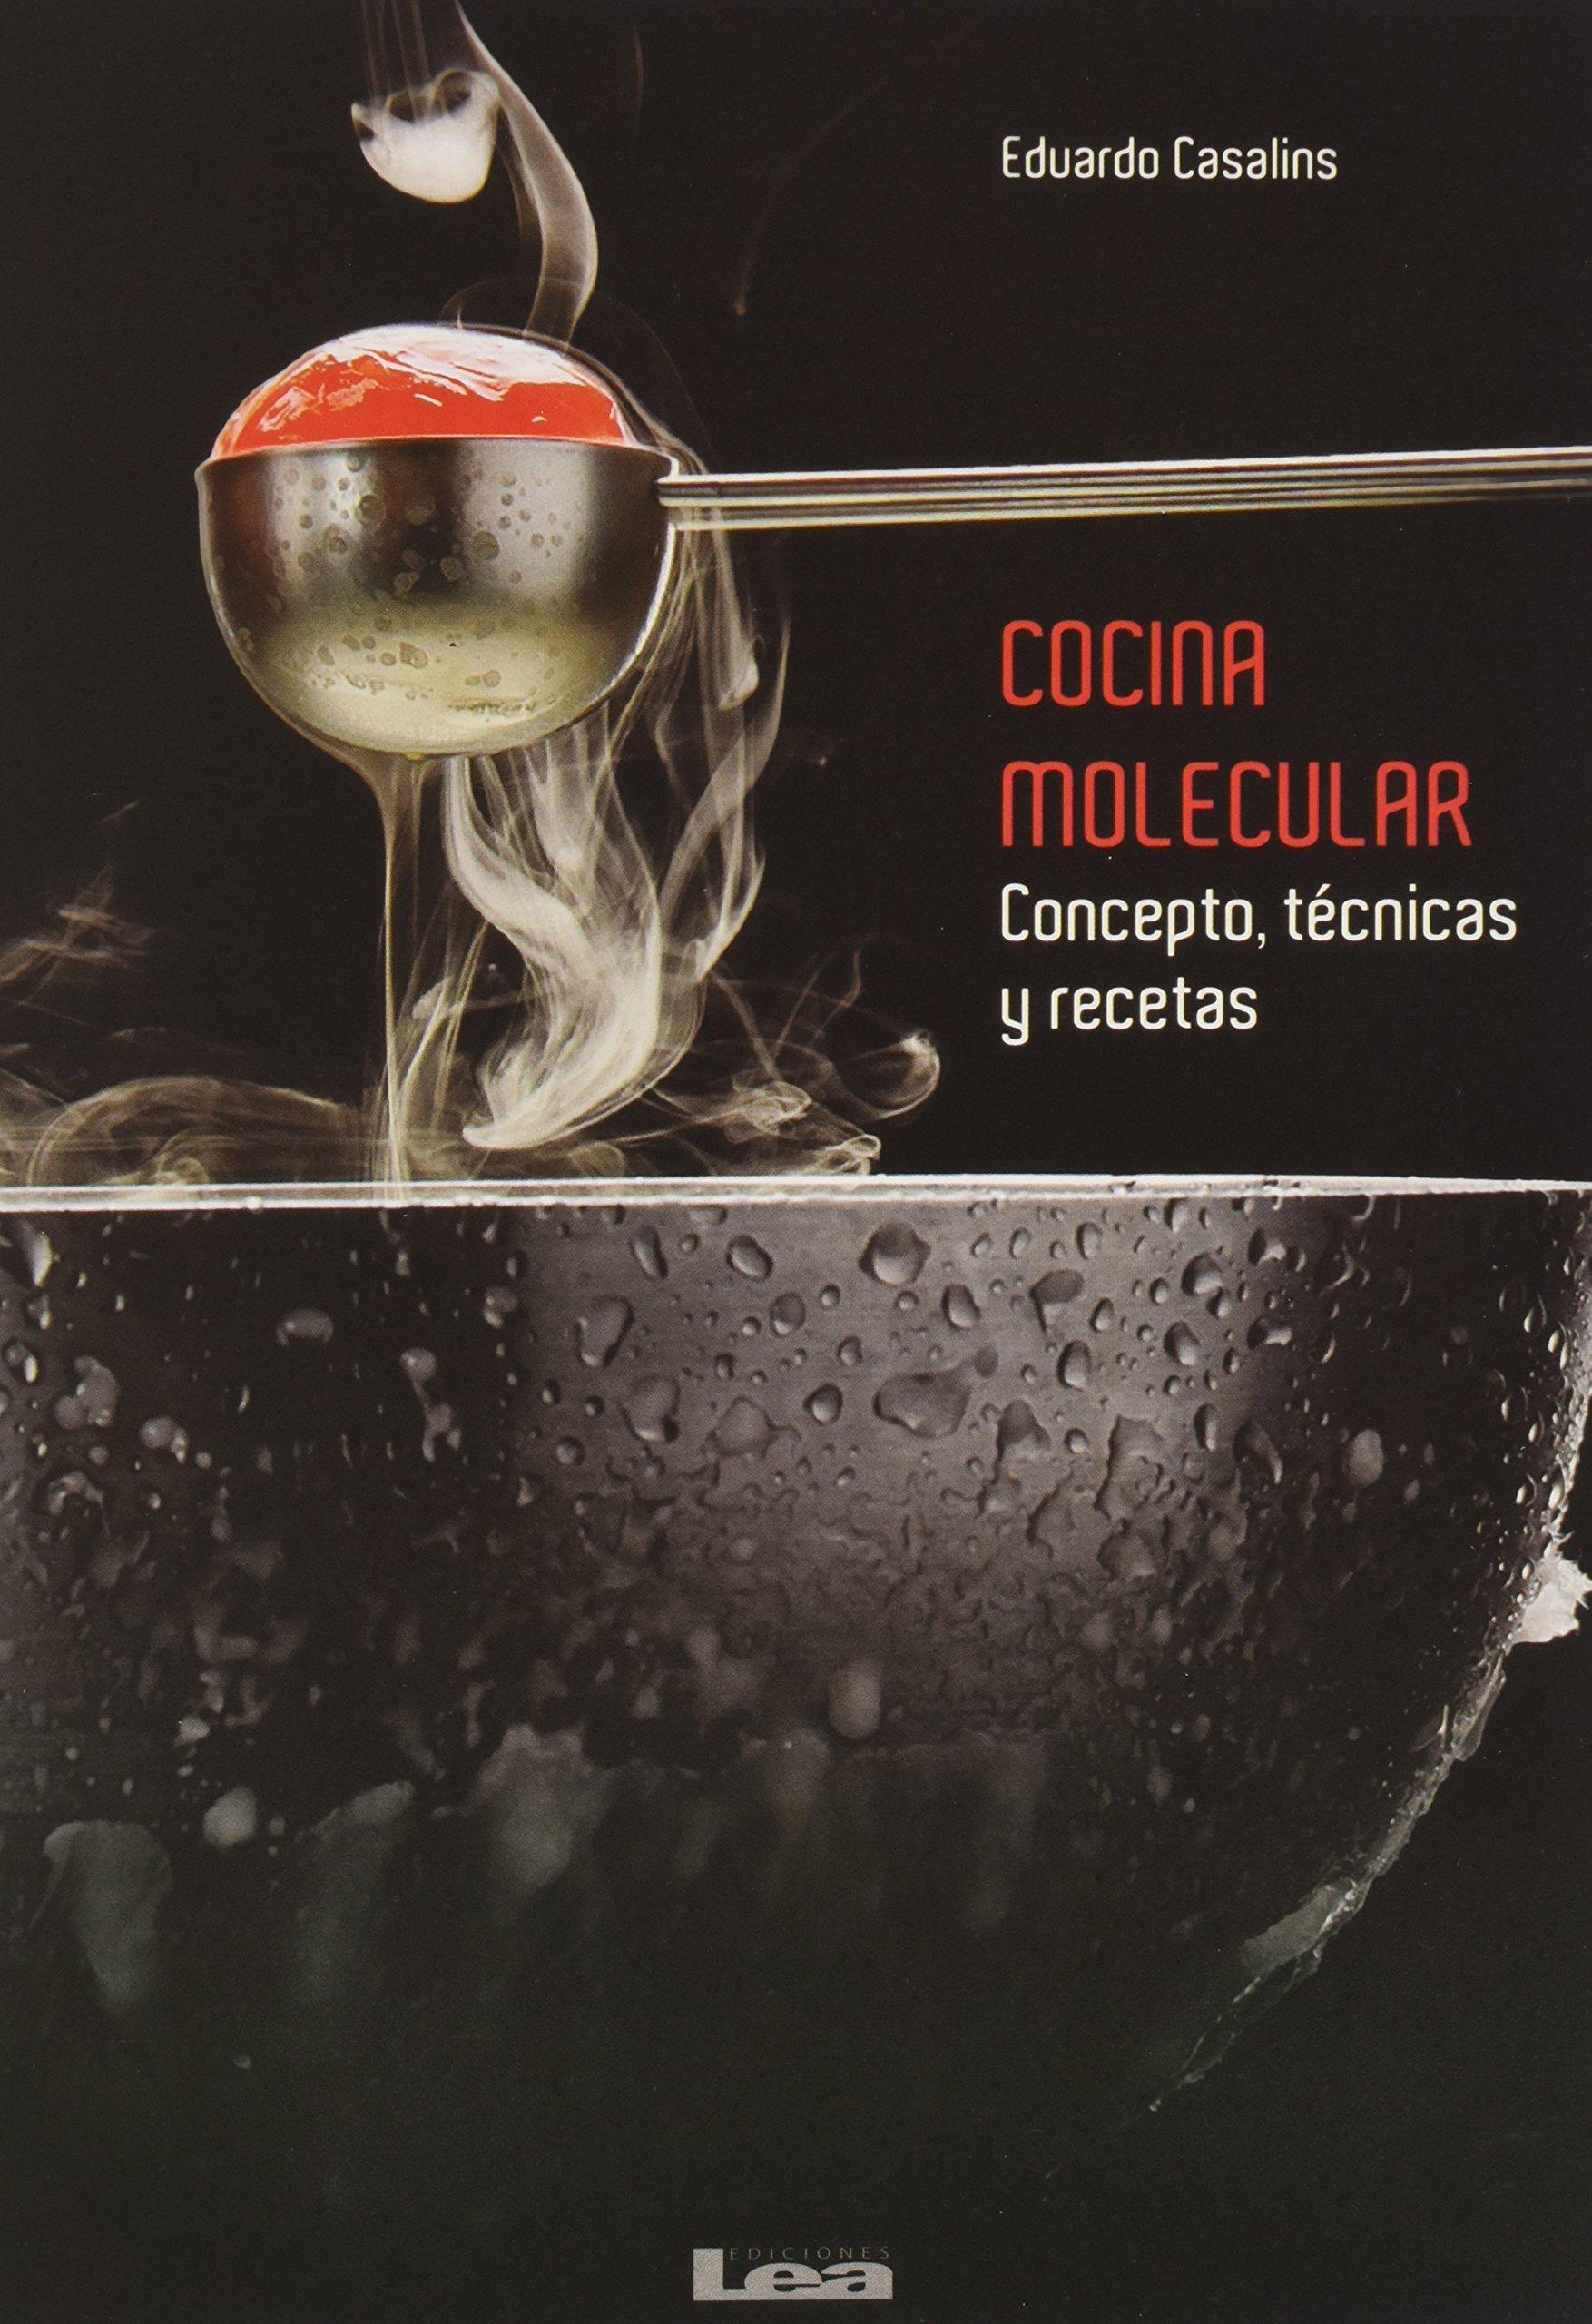 Recetas Cocina Molecular   Cocina Molecular Conceptos Tecnicas Y Recetas Amazon De Eduardo